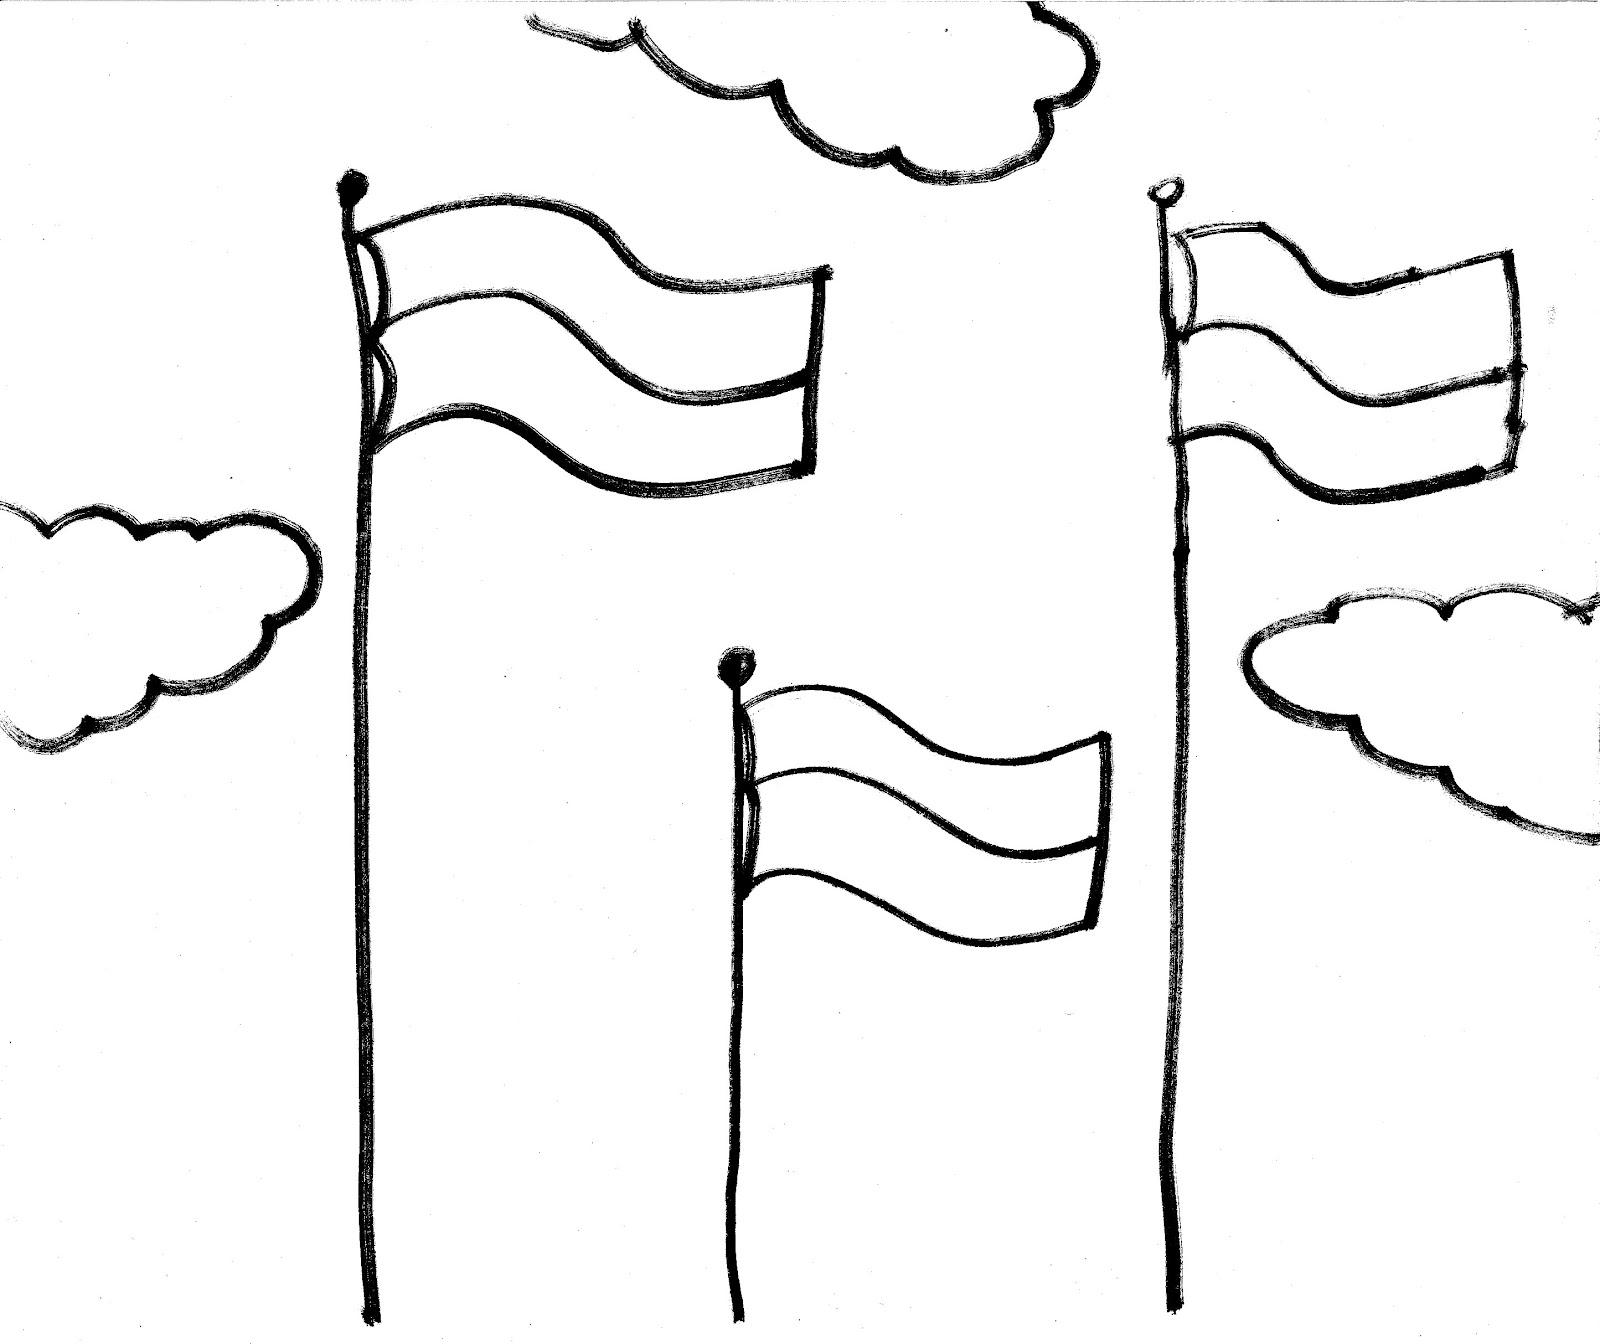 Mewarnai Gambar Untuk Anak Anak Mewarnai Gambar Bendera